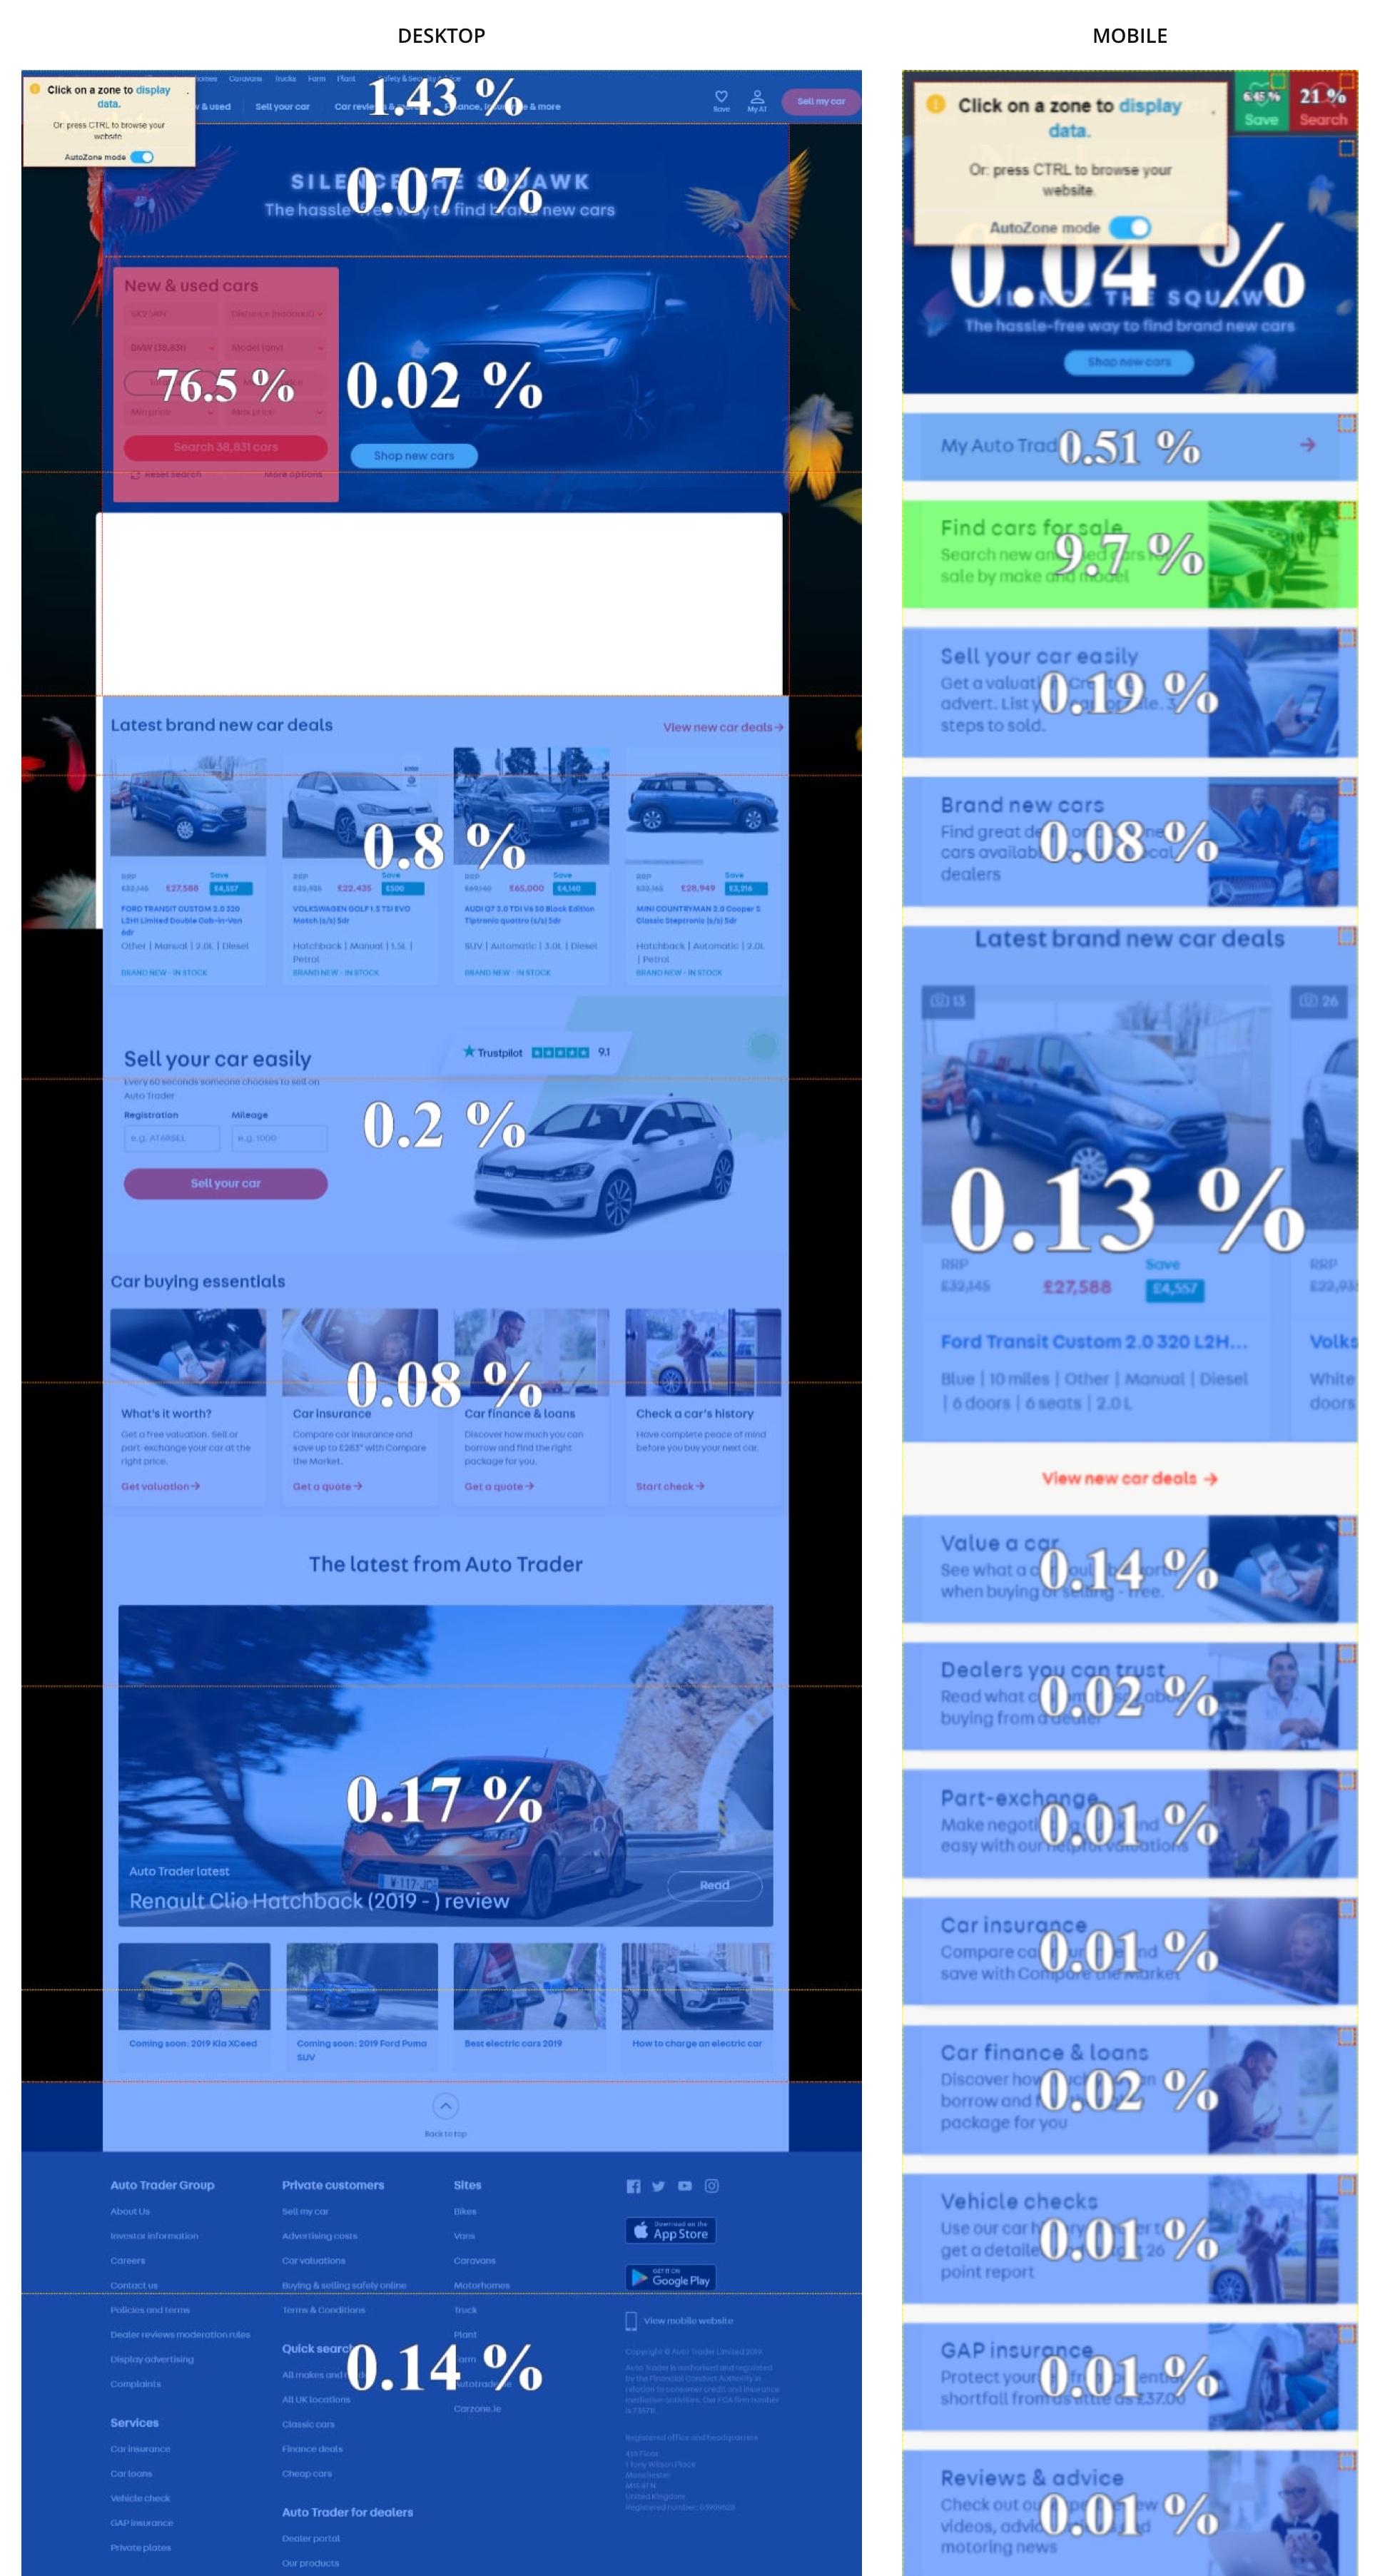 Compare desktop and mobile search click rate